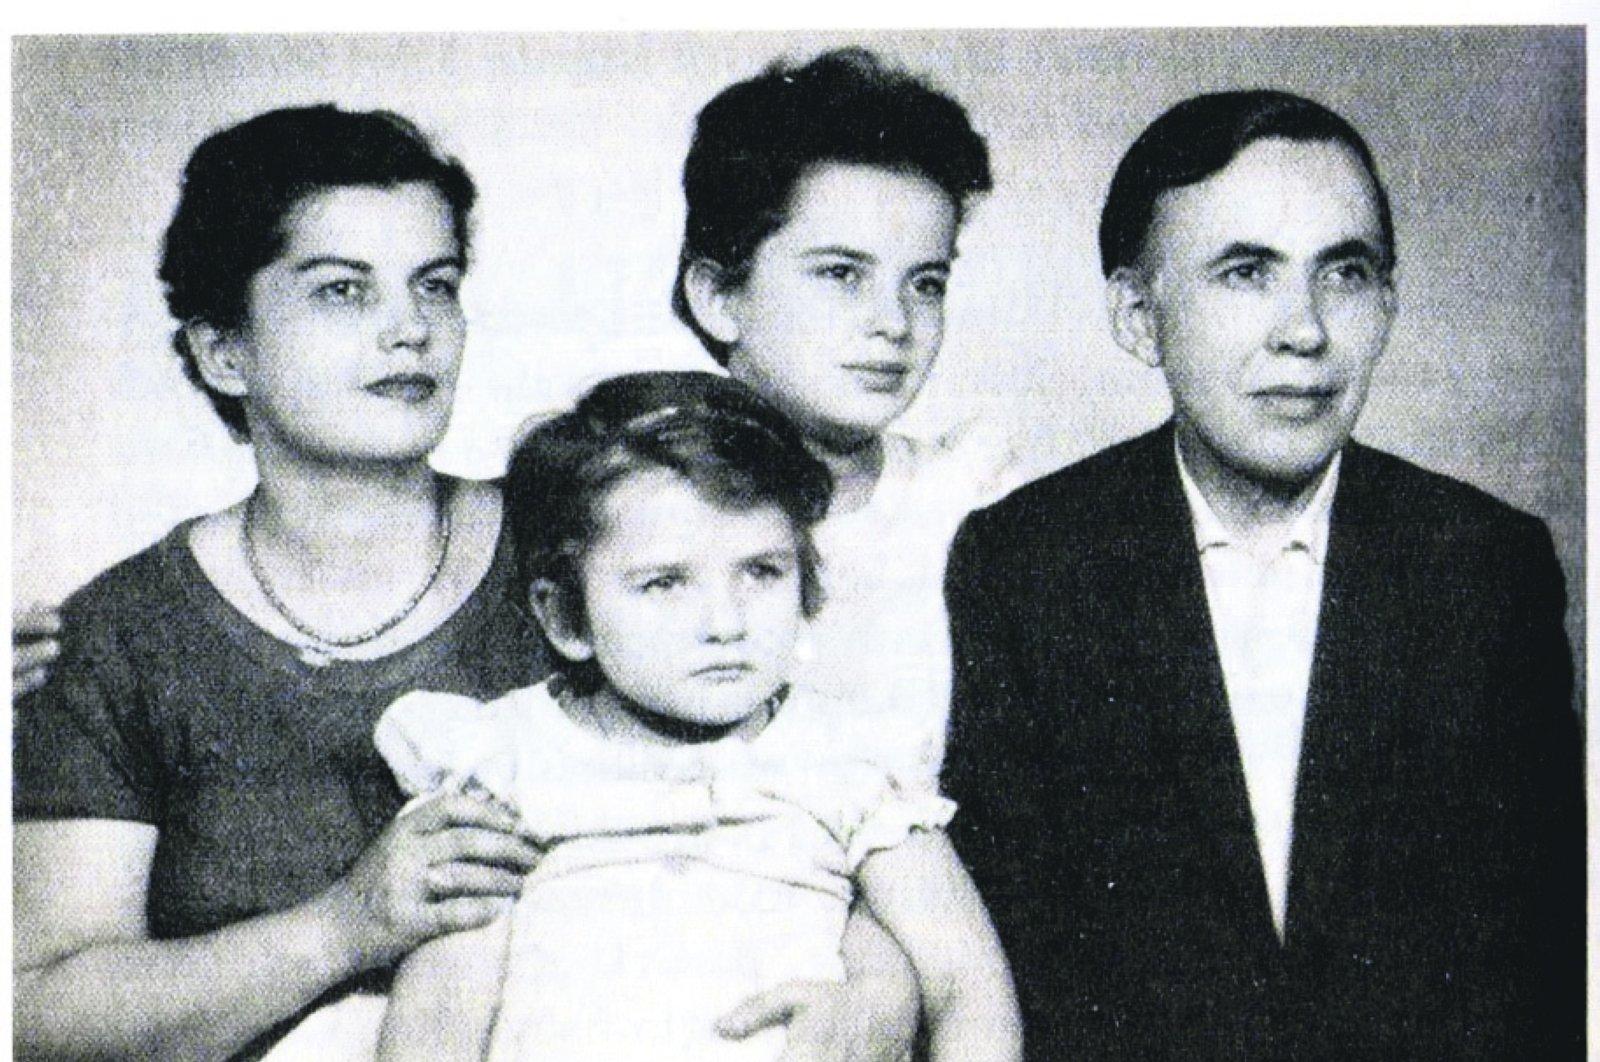 Behçet Necatigil (R) with his wife Huriye Korkut (L) and their daughters Ayşe and Selma (C).